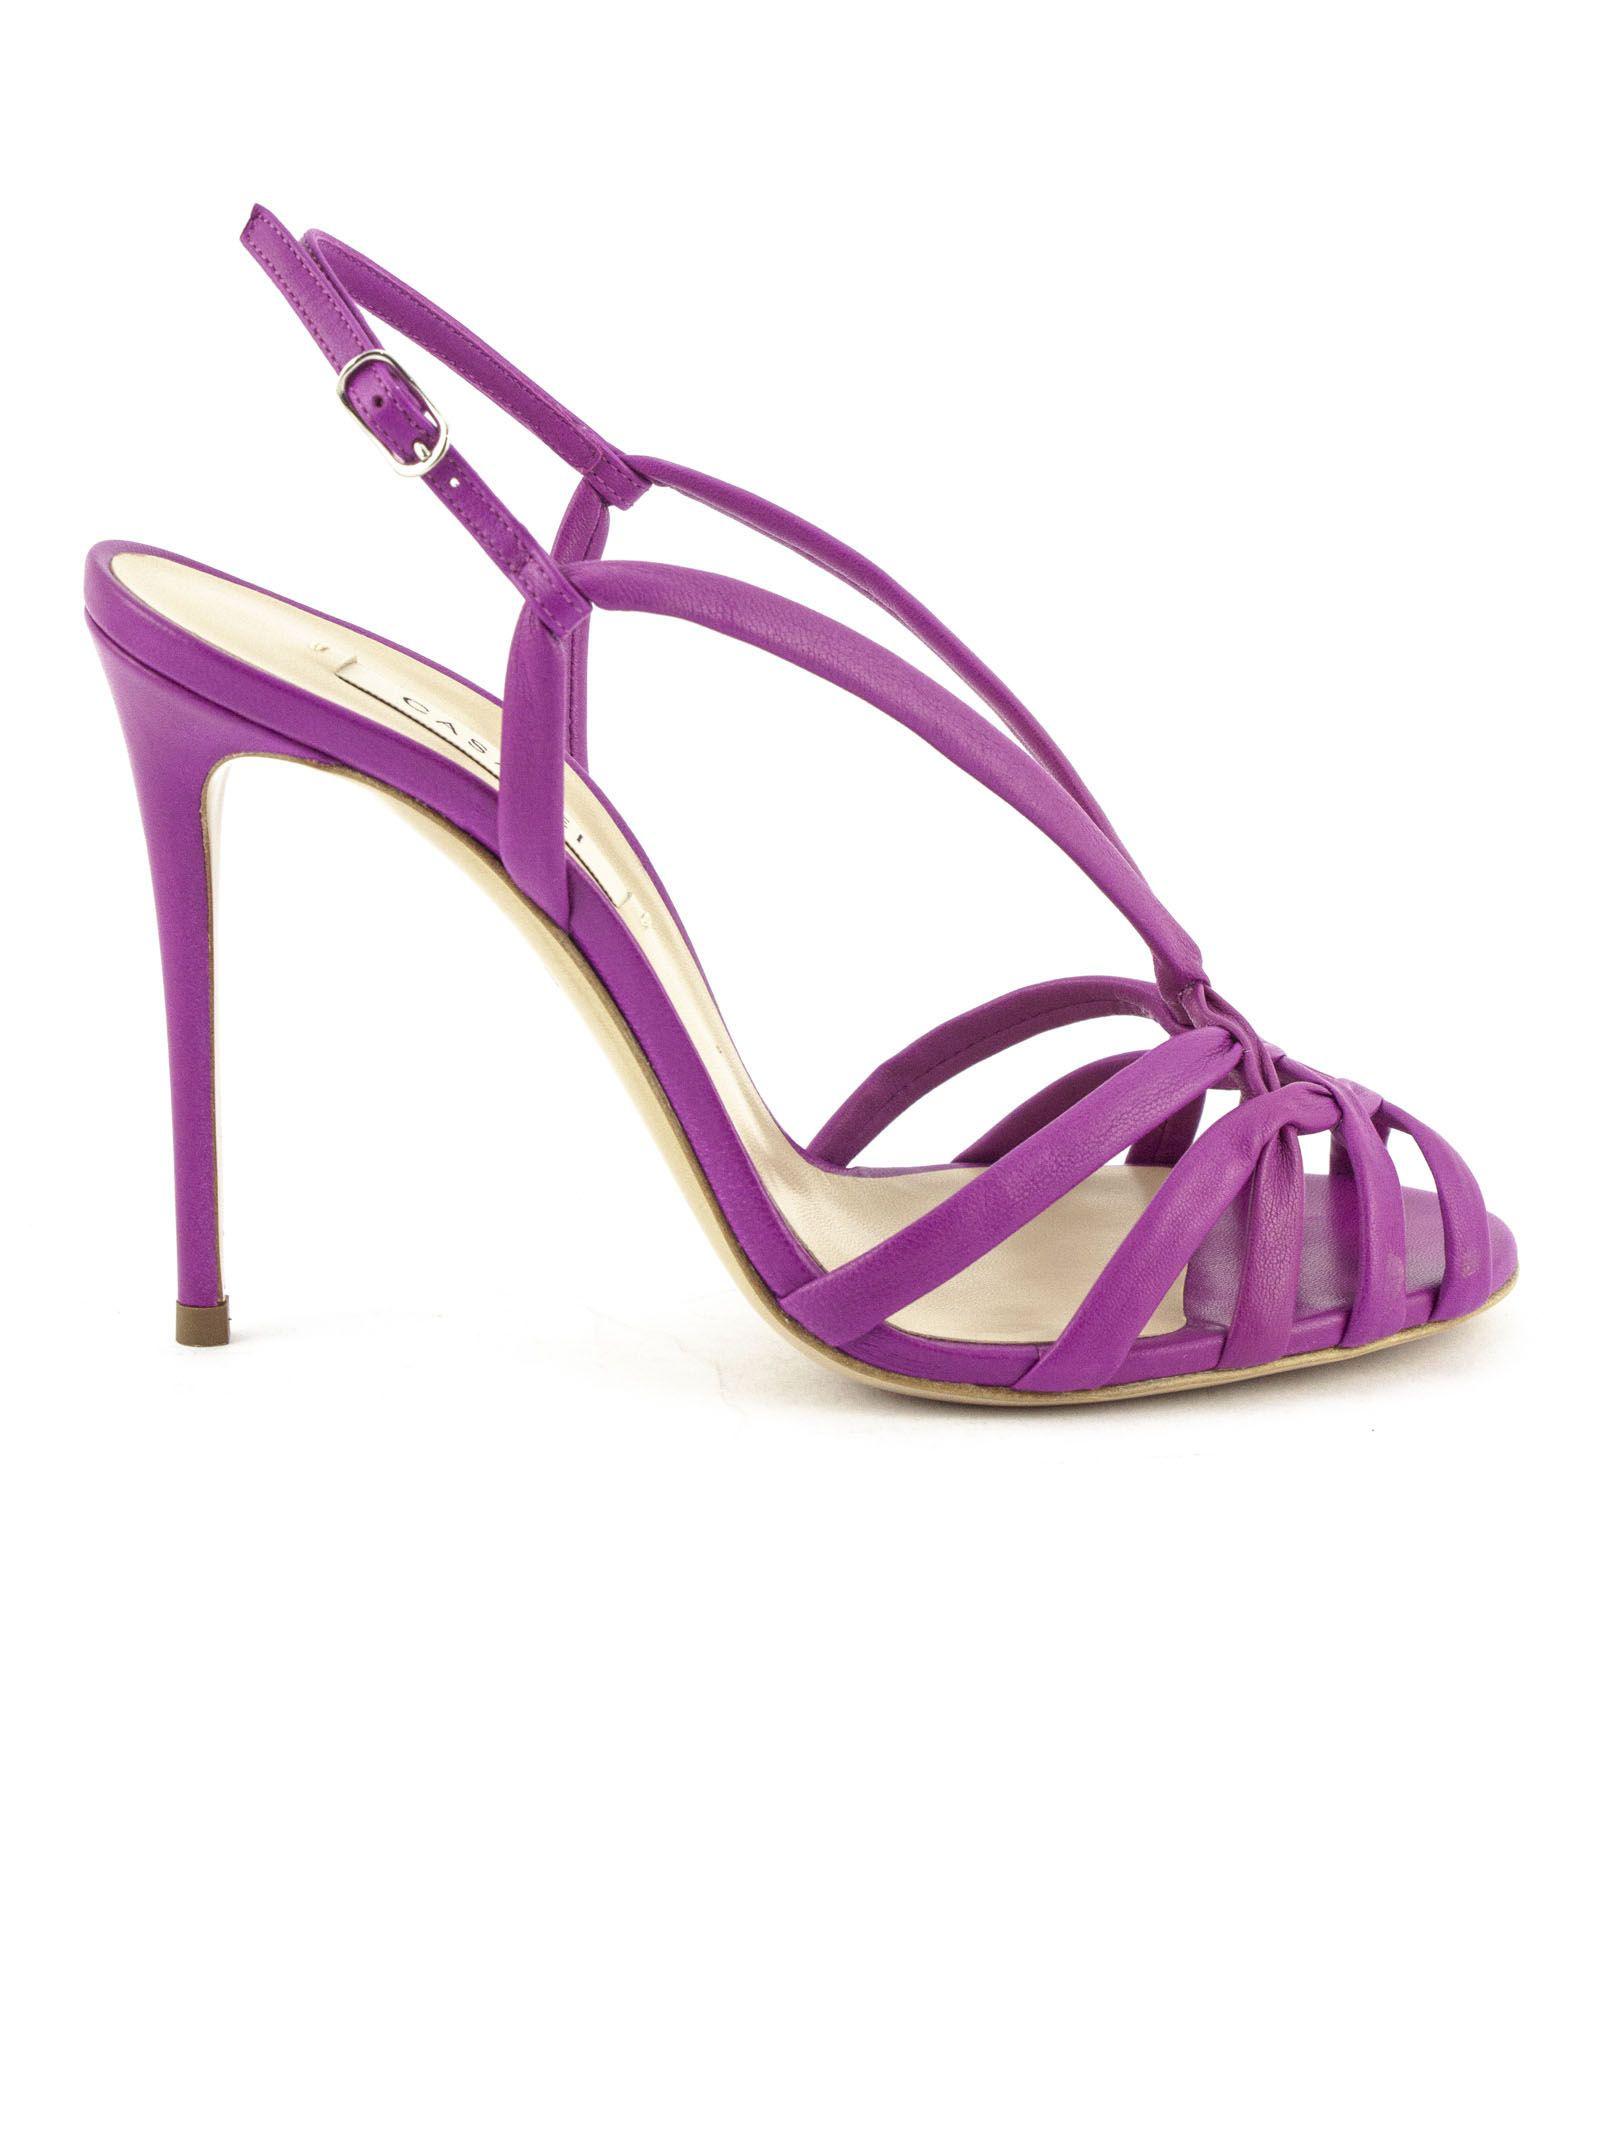 Casadei Fuchsia High-Heel Minorca Sandals In Fuxia